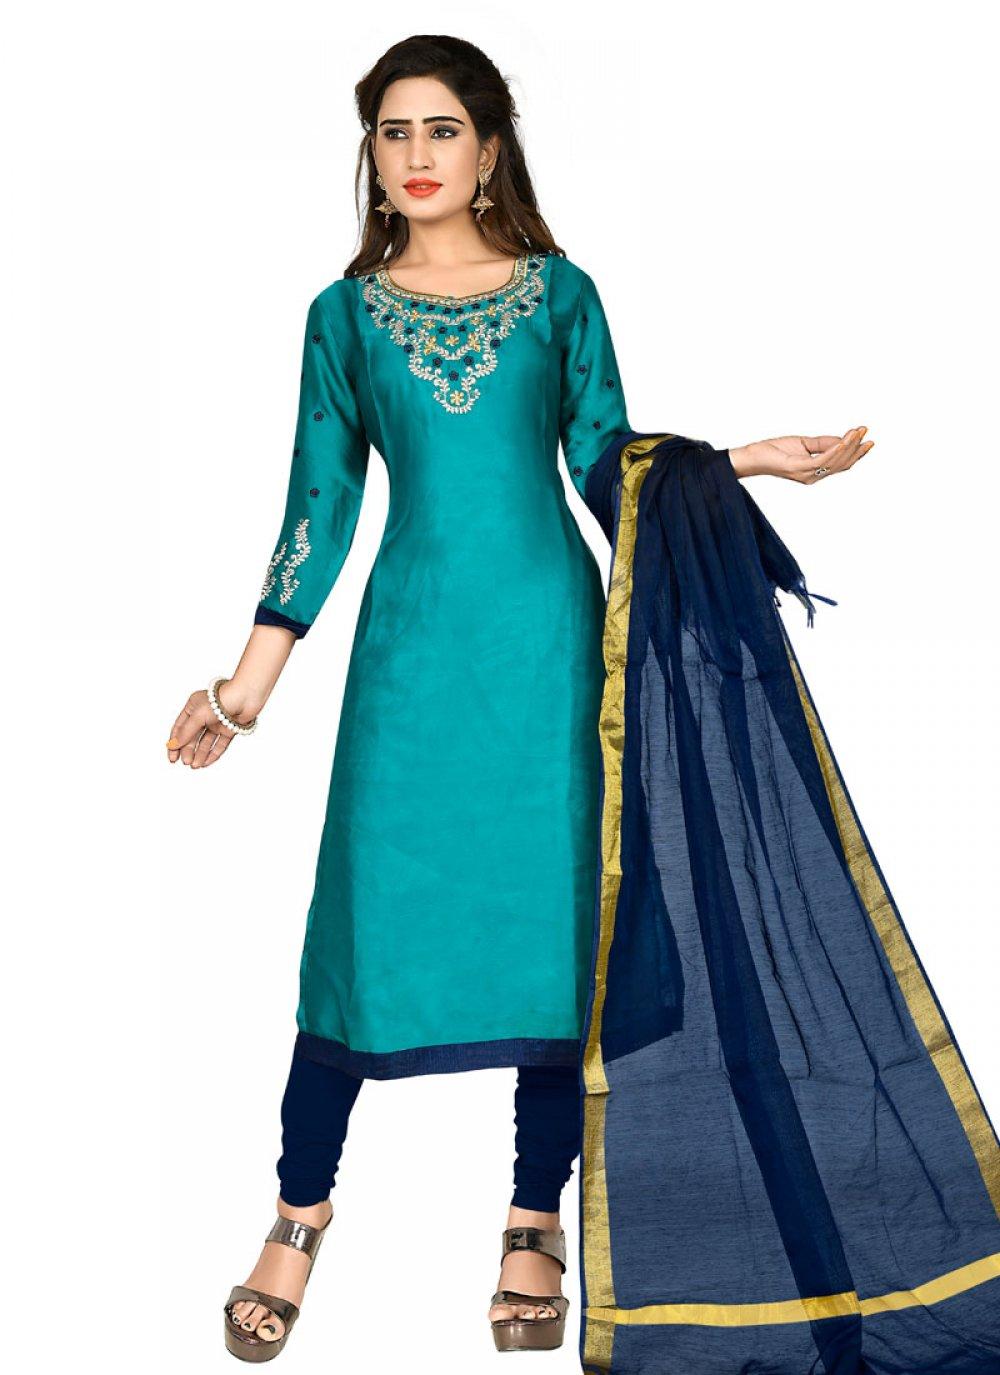 Blue Party Salwar Kameez